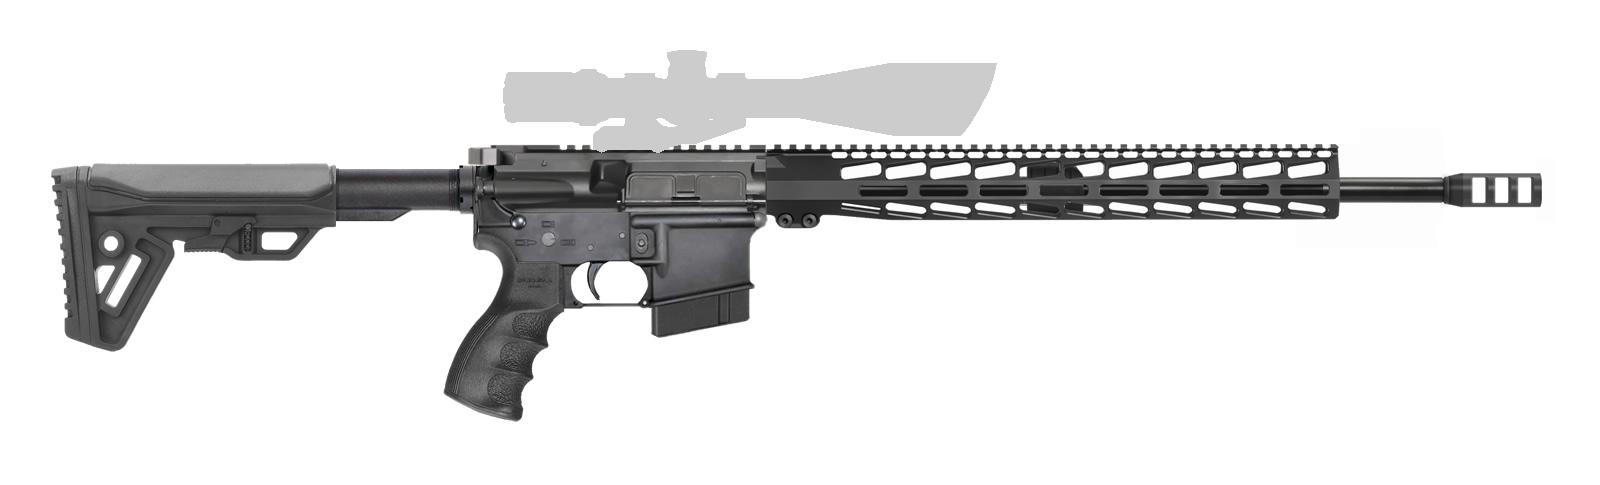 AR-15 Ambush 6.5 Grendel Complete AR Rifle